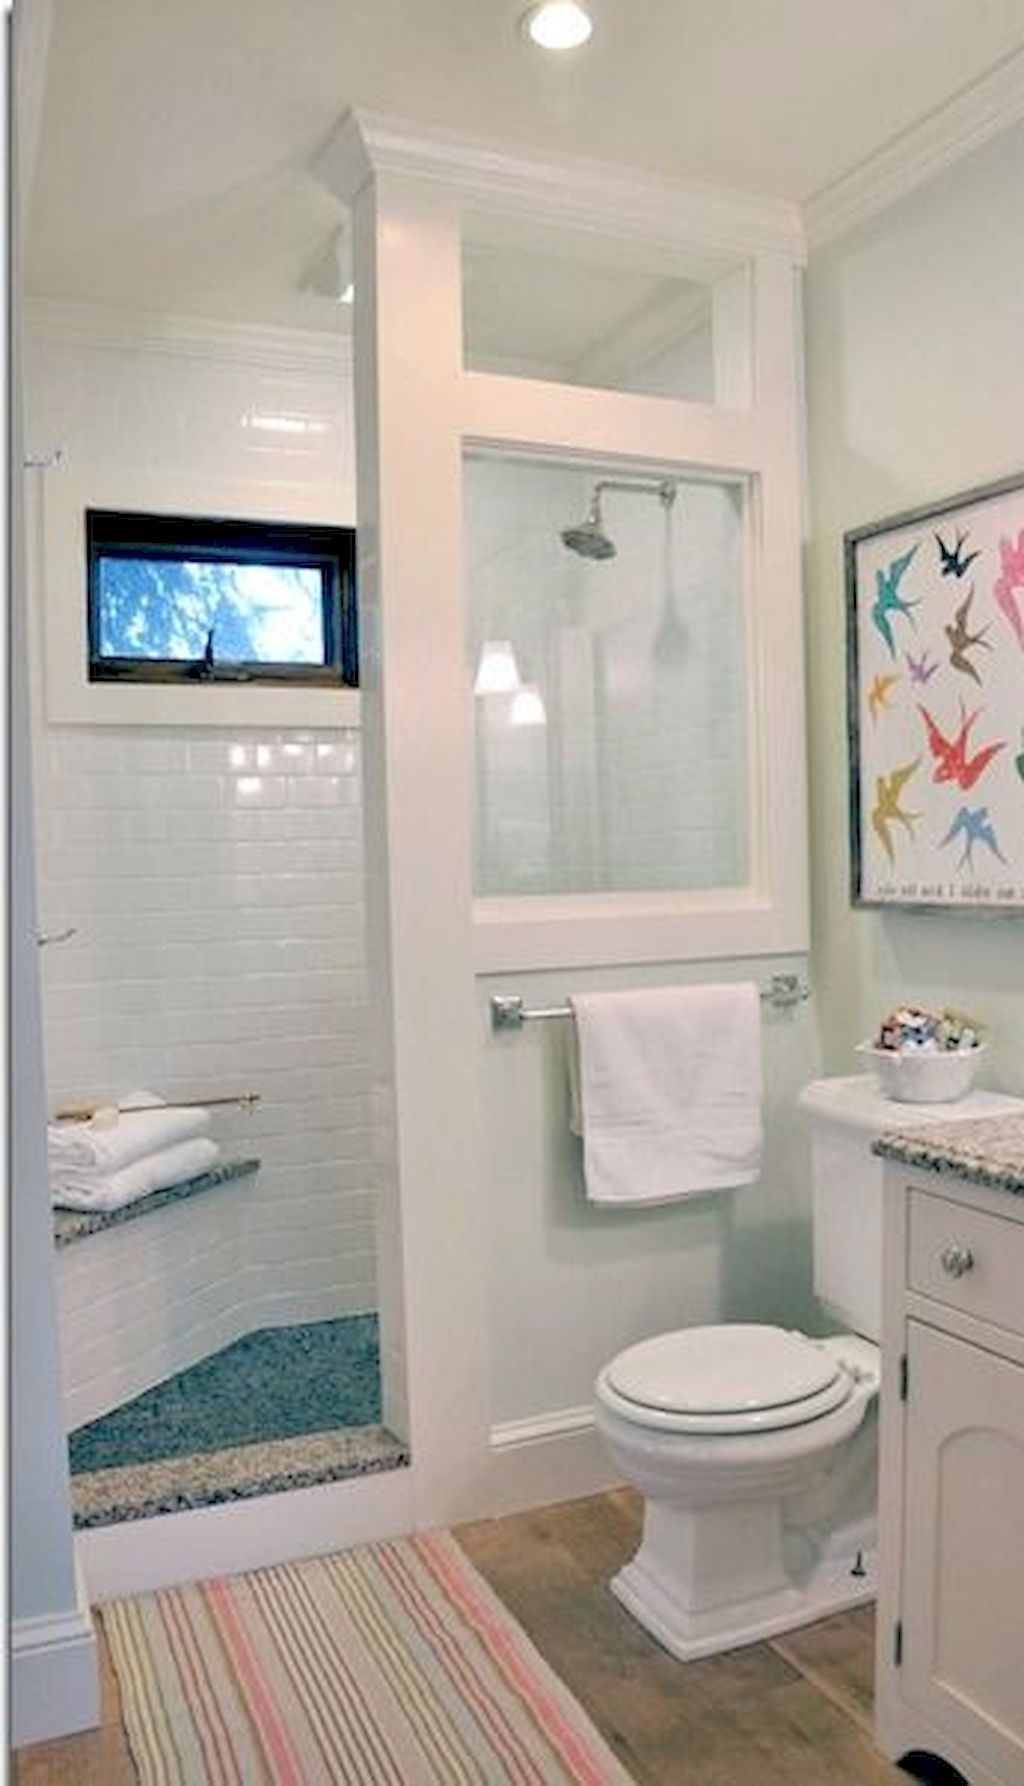 Cool 30 Modern Bathroom Remodel Designs Ideas More At Https Trendhmdcr